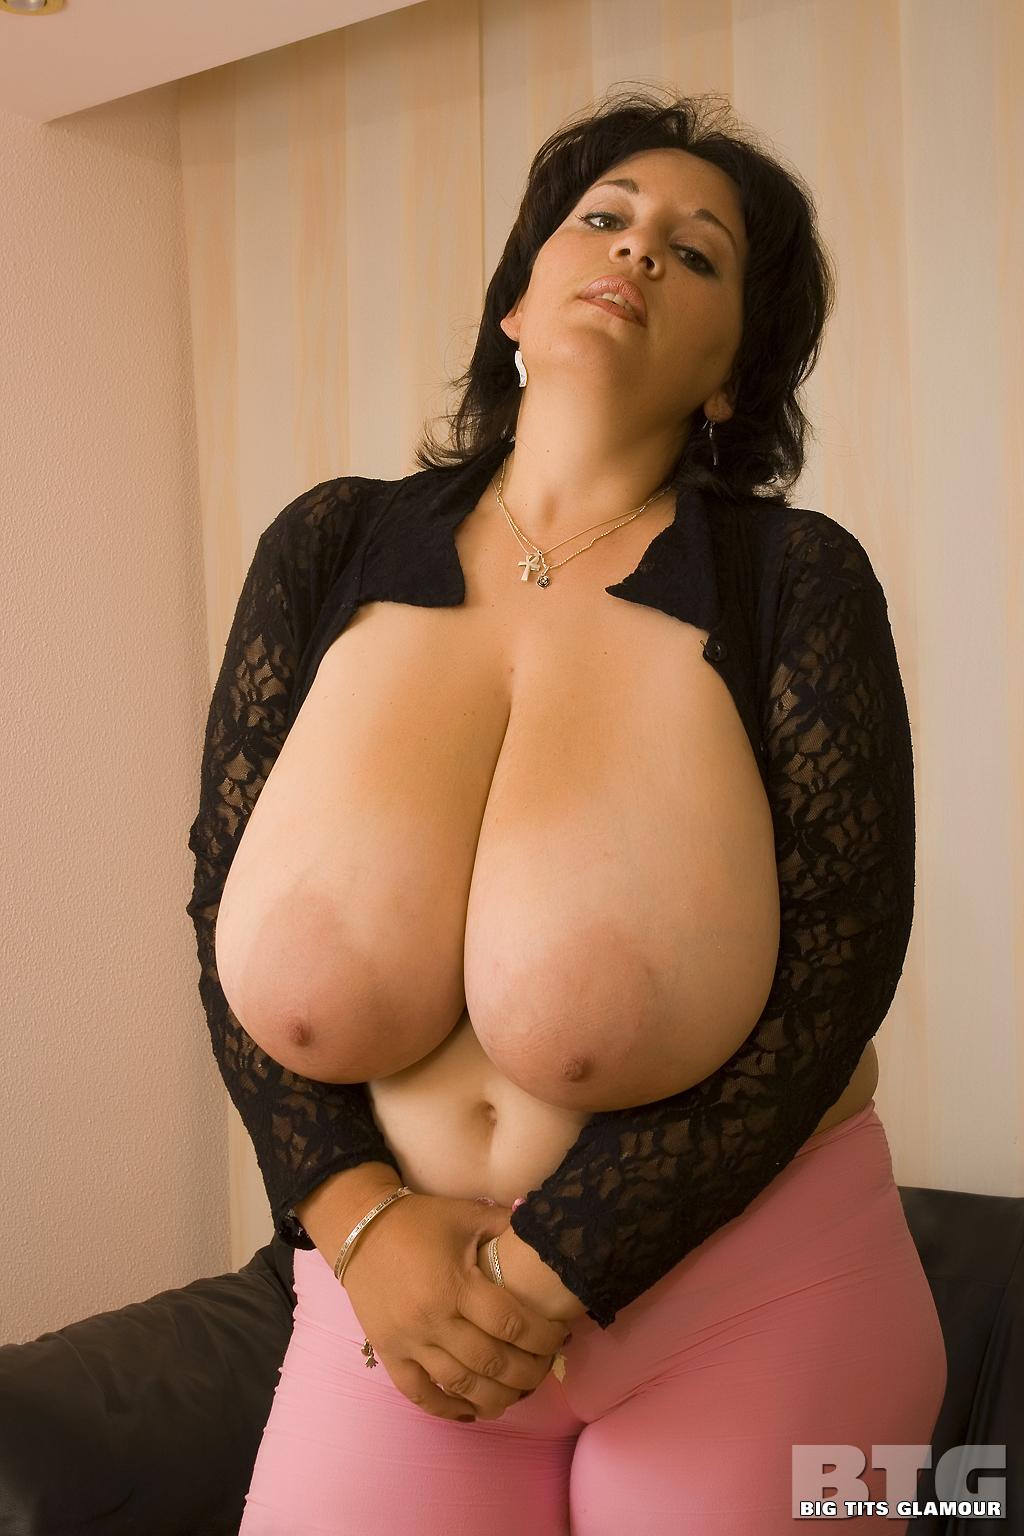 Bianca Bloom Huge Boobs